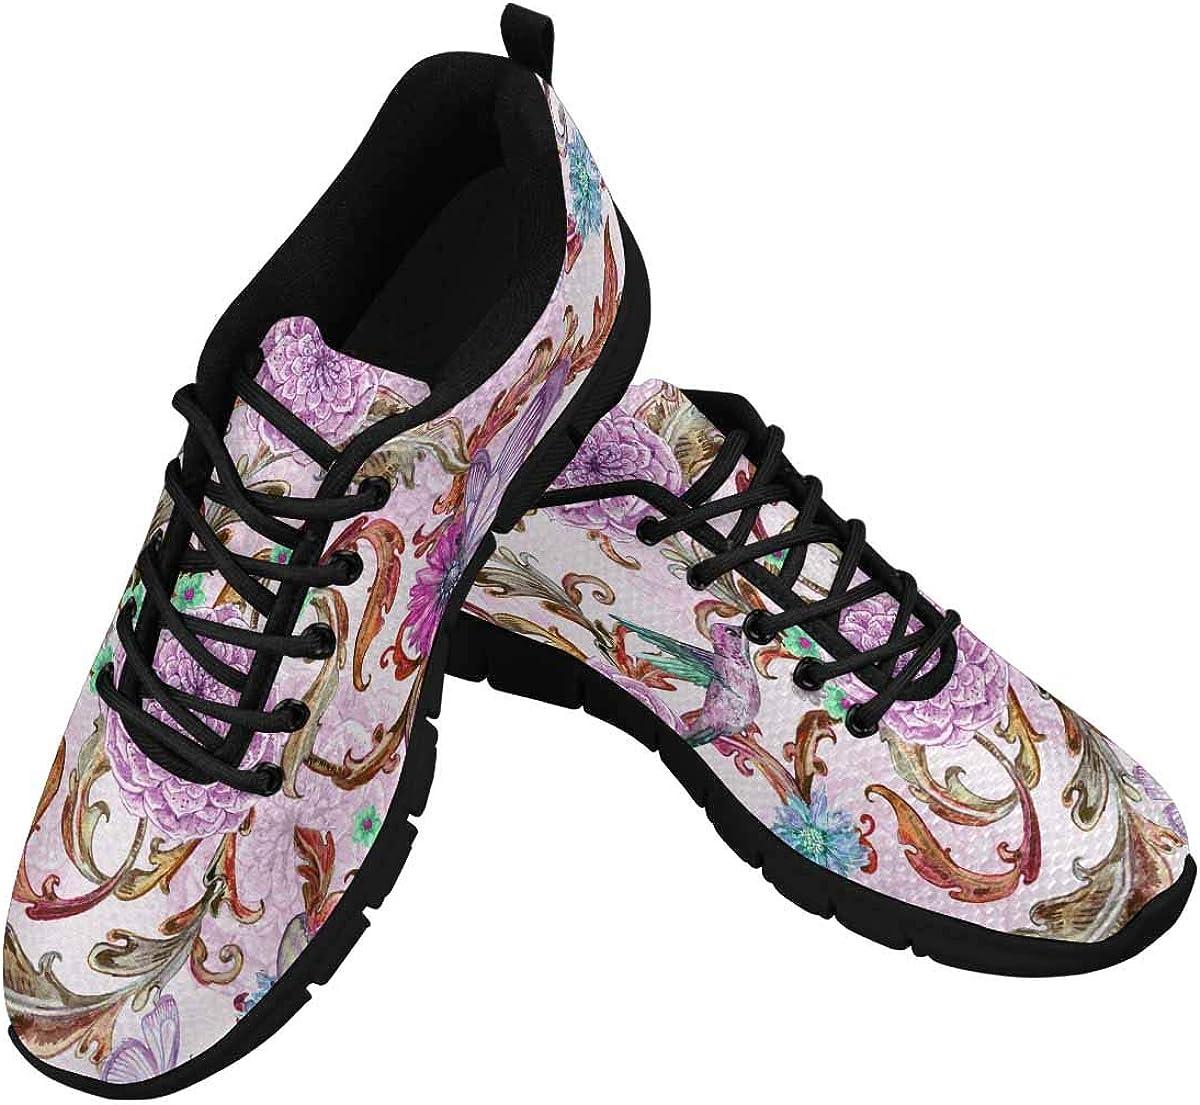 INTERESTPRINT Fantasy Purple Floral Women's Breathable Non Slip Sneakers